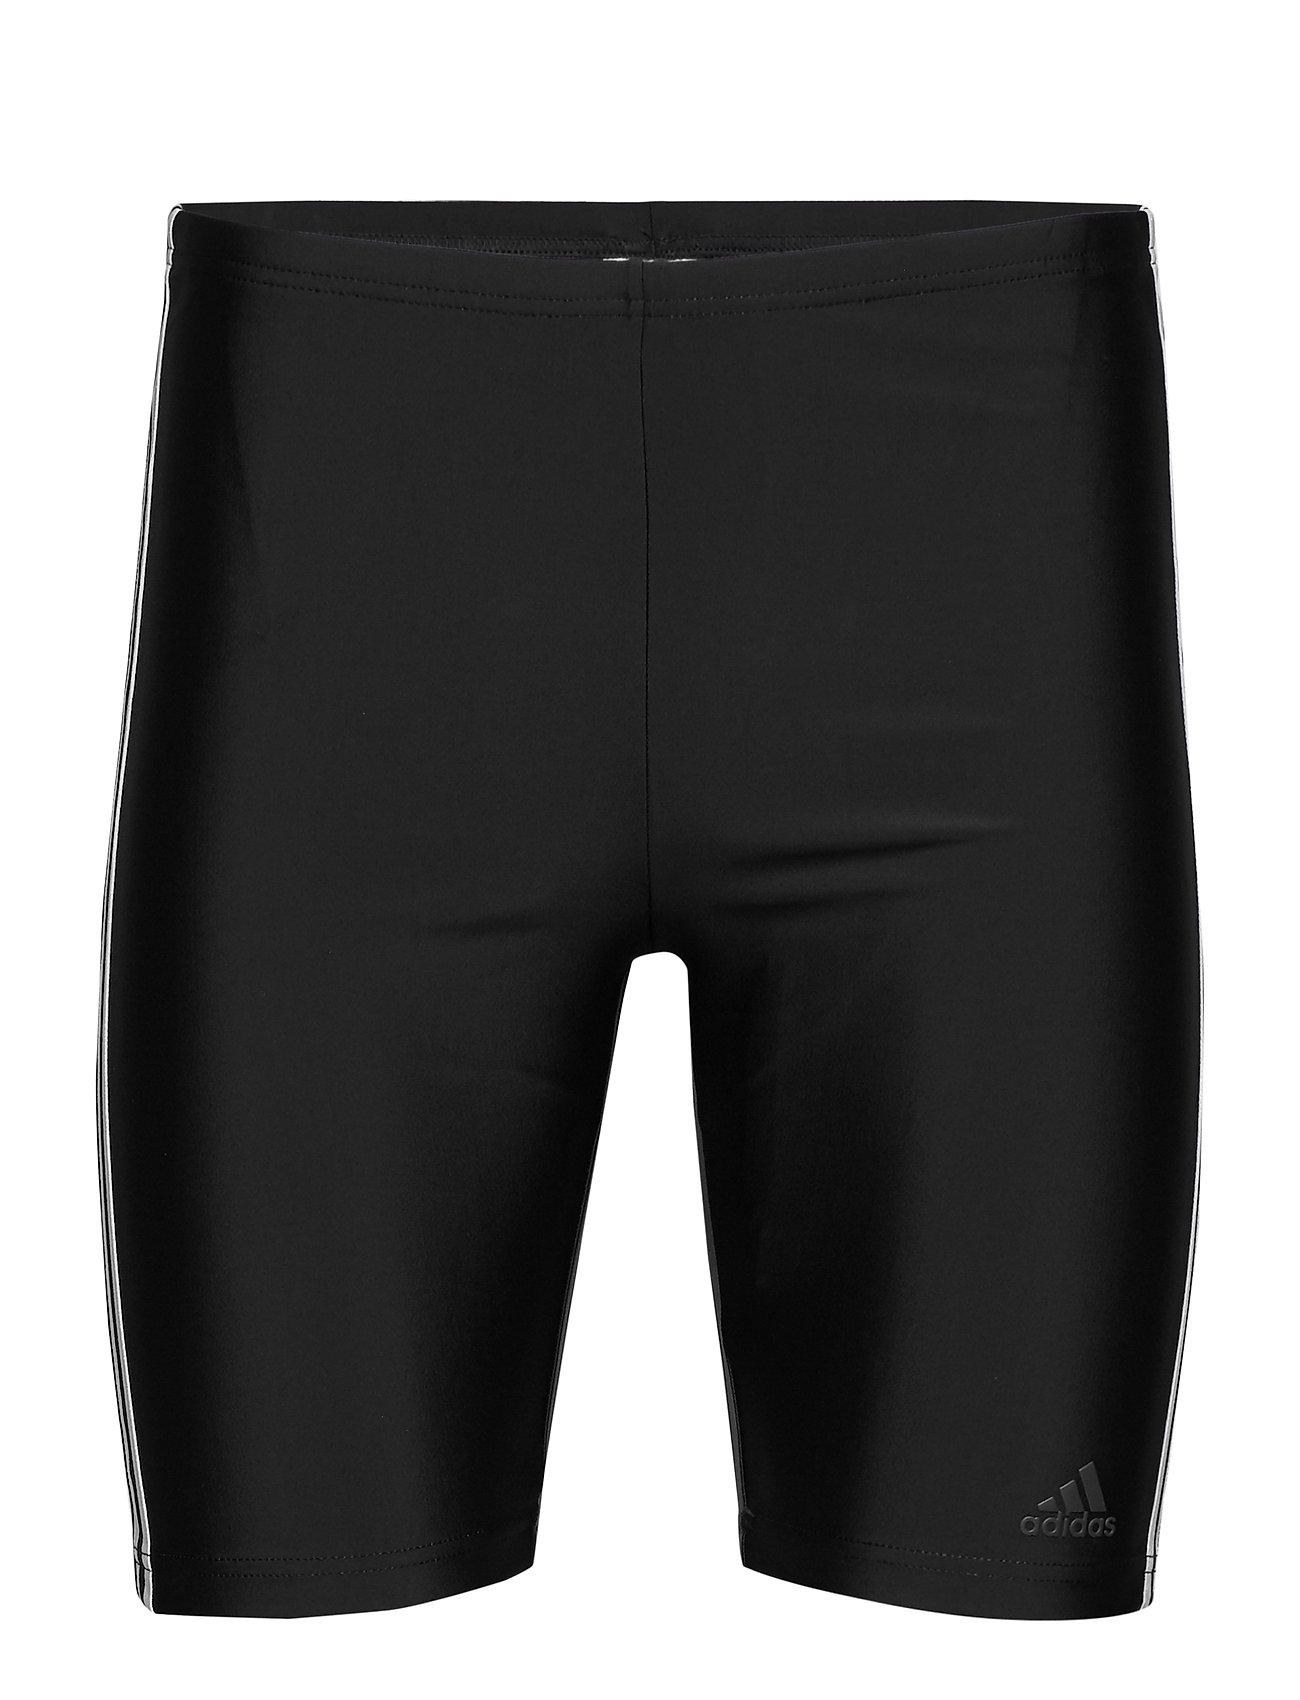 adidas Performance FIT JAM 3S - BLACK/WHITE